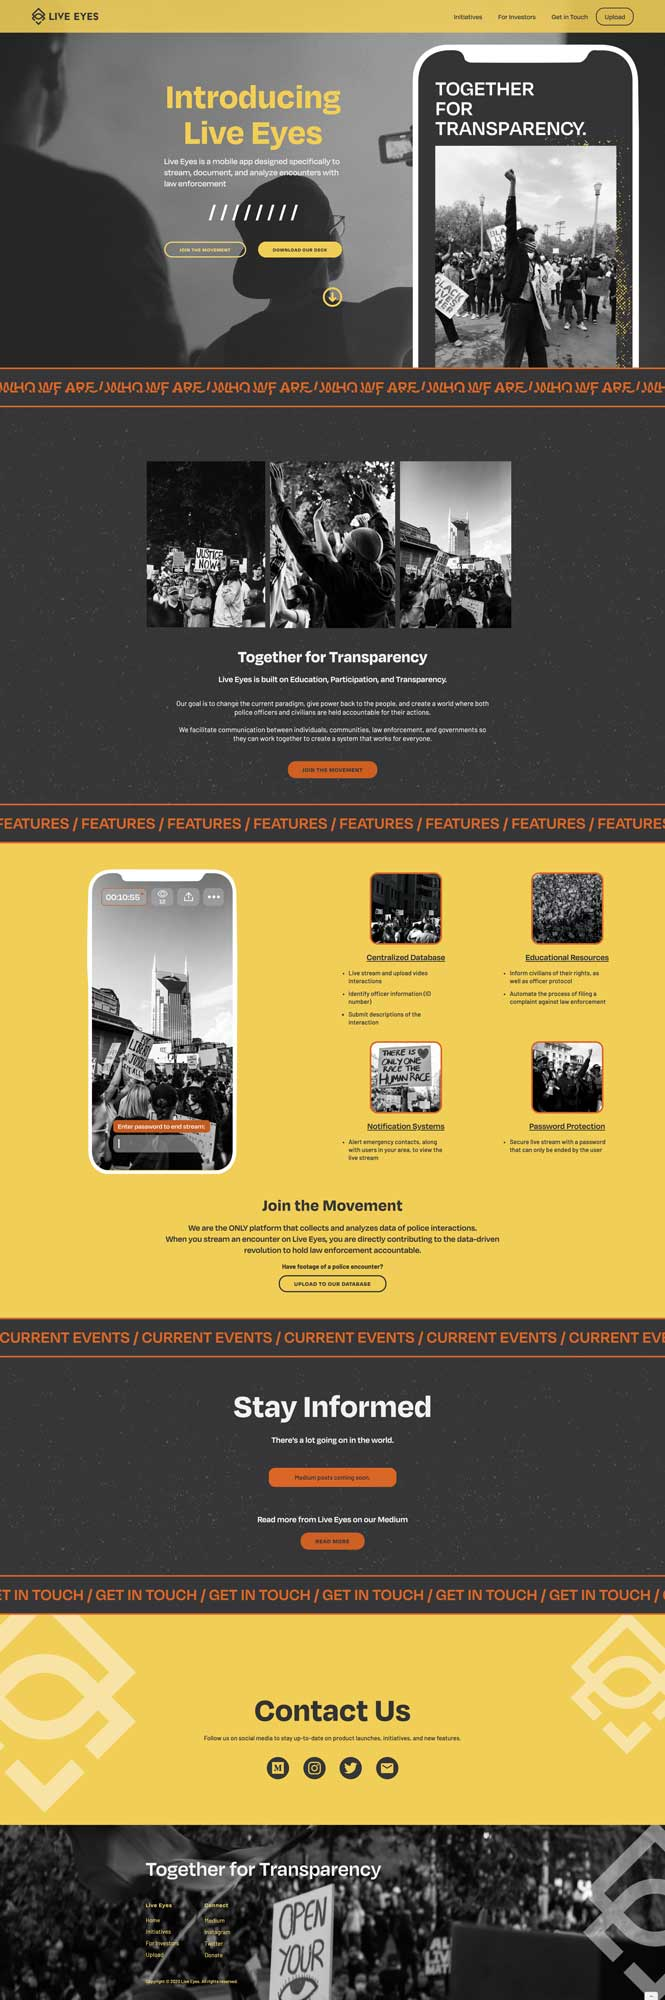 screencapture-liveeyes-app-2021-03-25-18_42_30